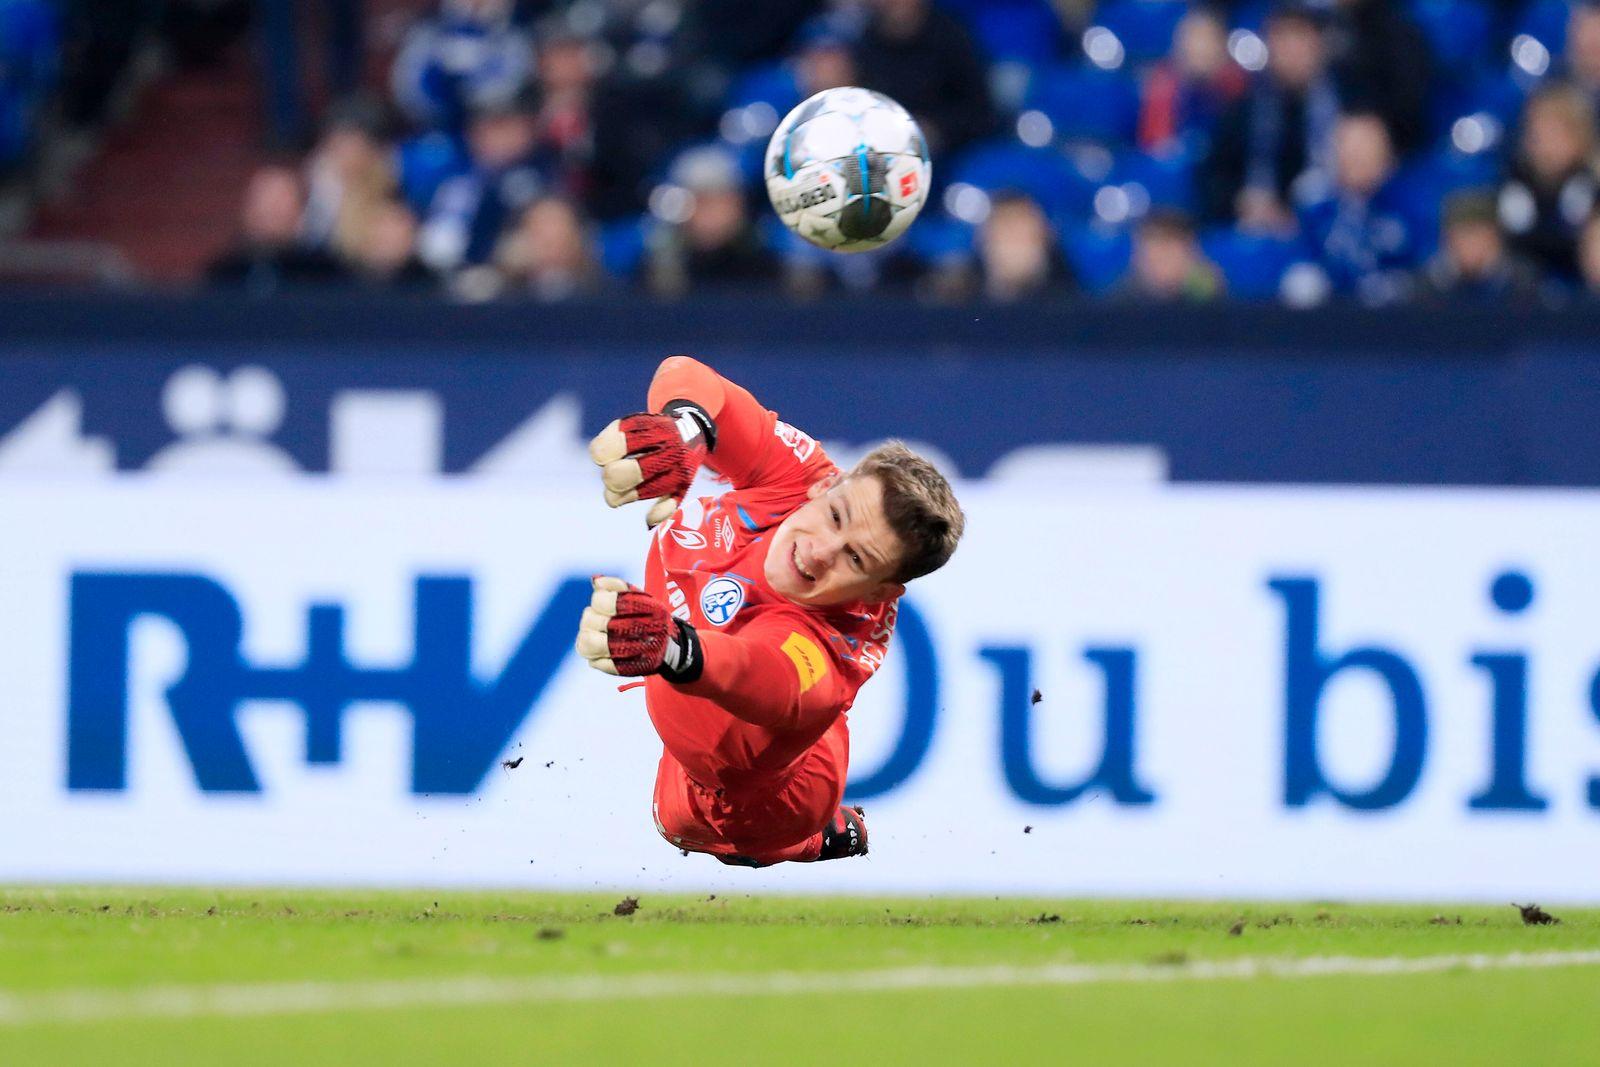 NUEBEL Alexander Torwart Team SC Schalke 04 DFL Fussball Bundesliga Saison 2019 - 2020 Spiel FC Schalke 04 - SC Paderbor